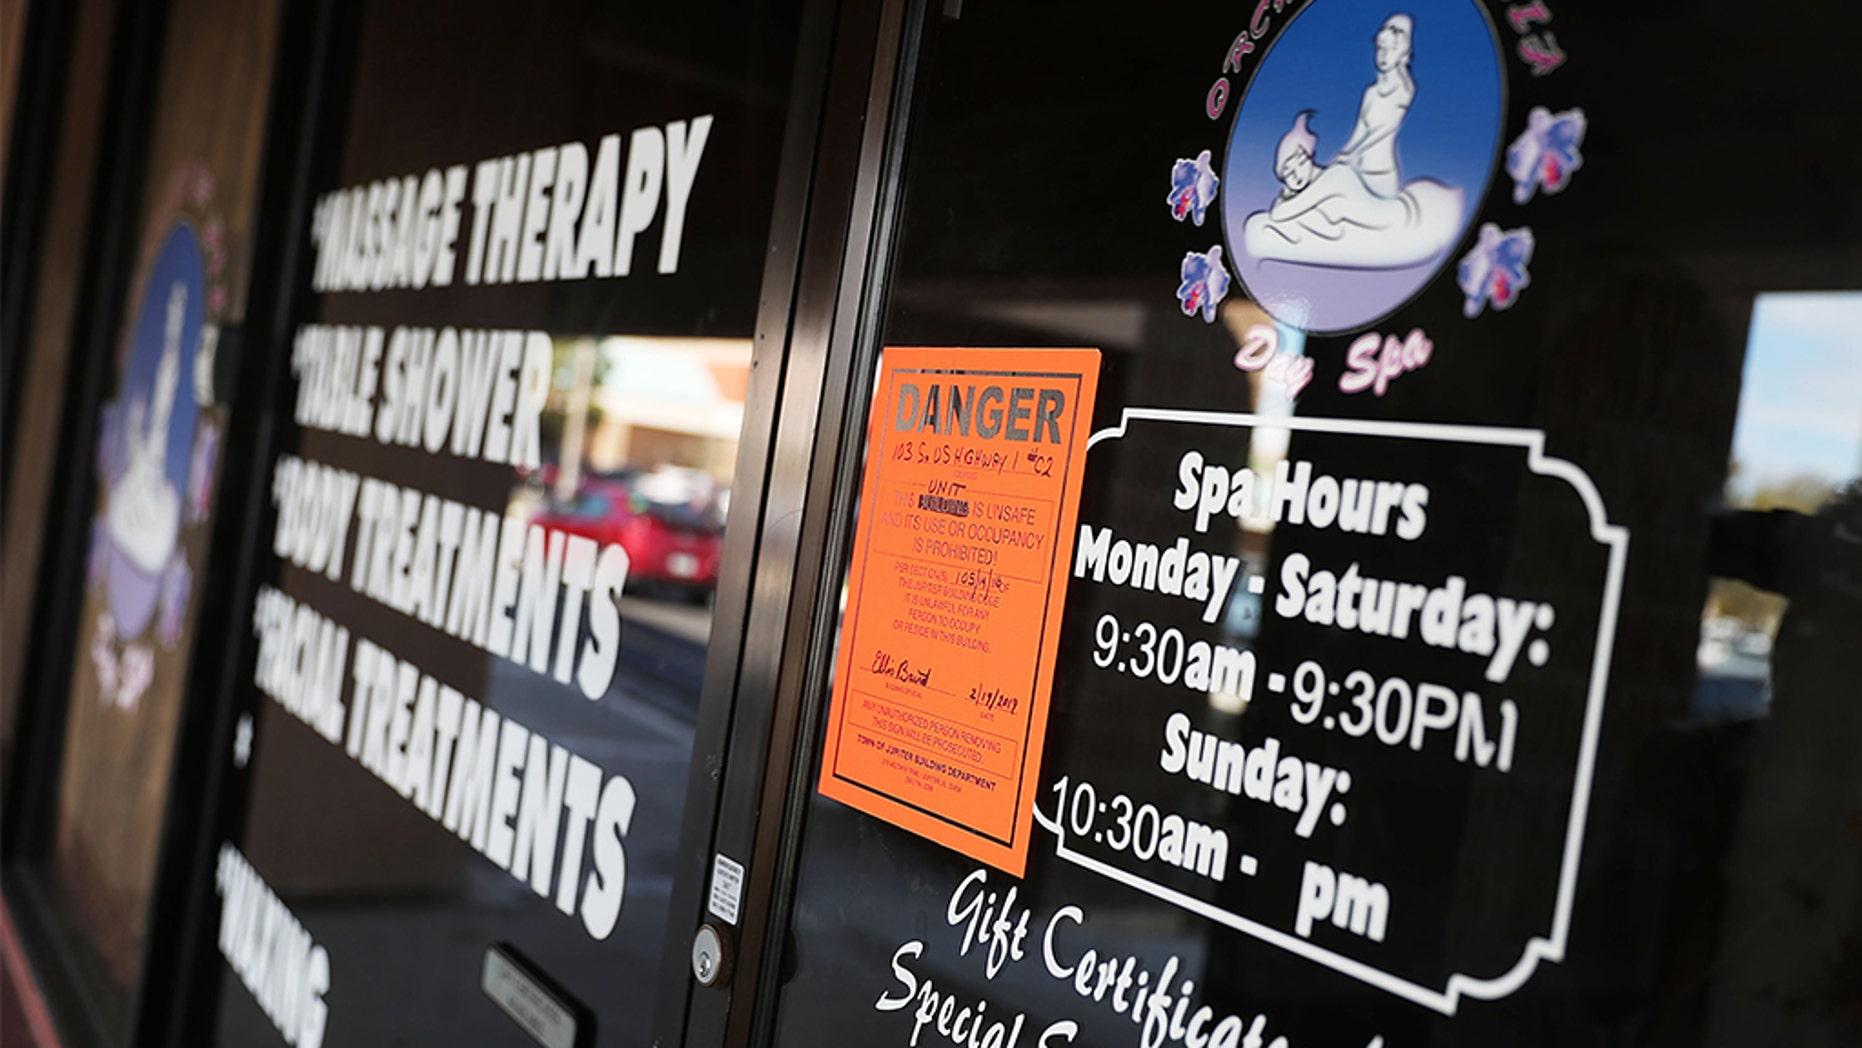 Kraft case casts uncomfortable spotlight on depths of massage parlor sex trafficking in US